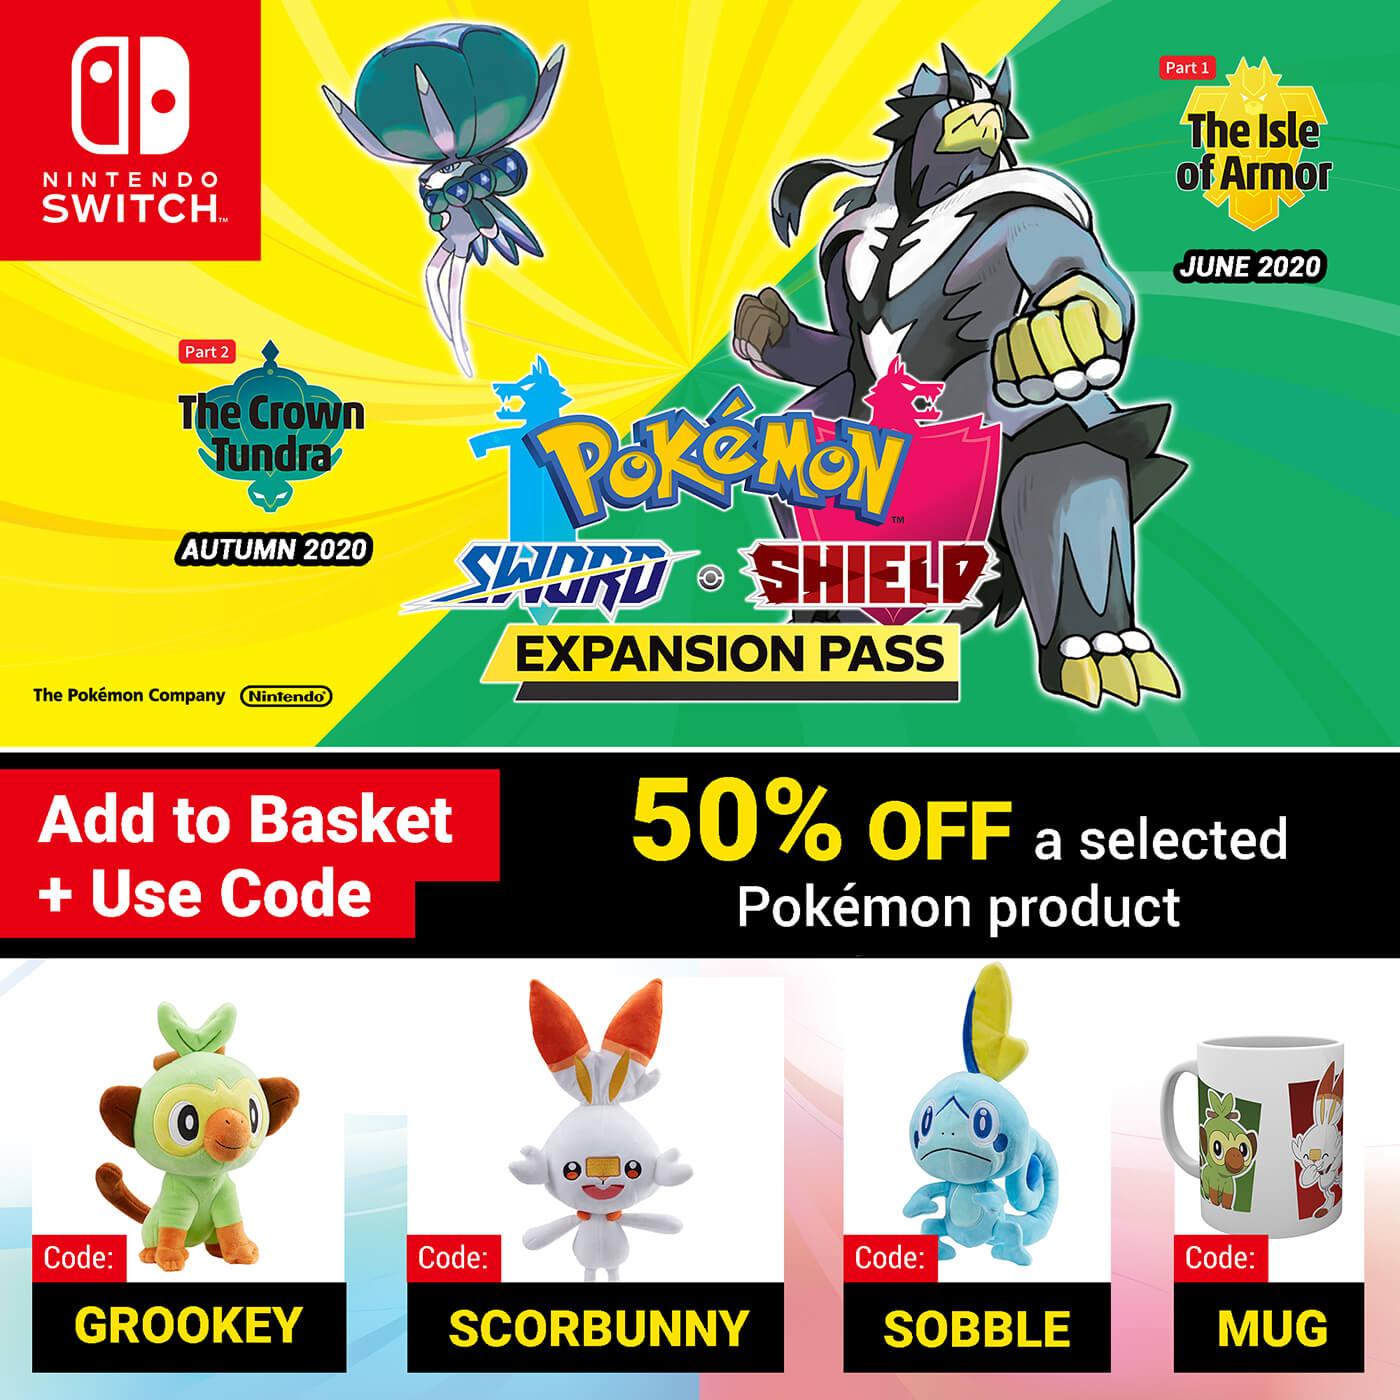 Pokémon Sword and Pokémon Shield Expansion Pass